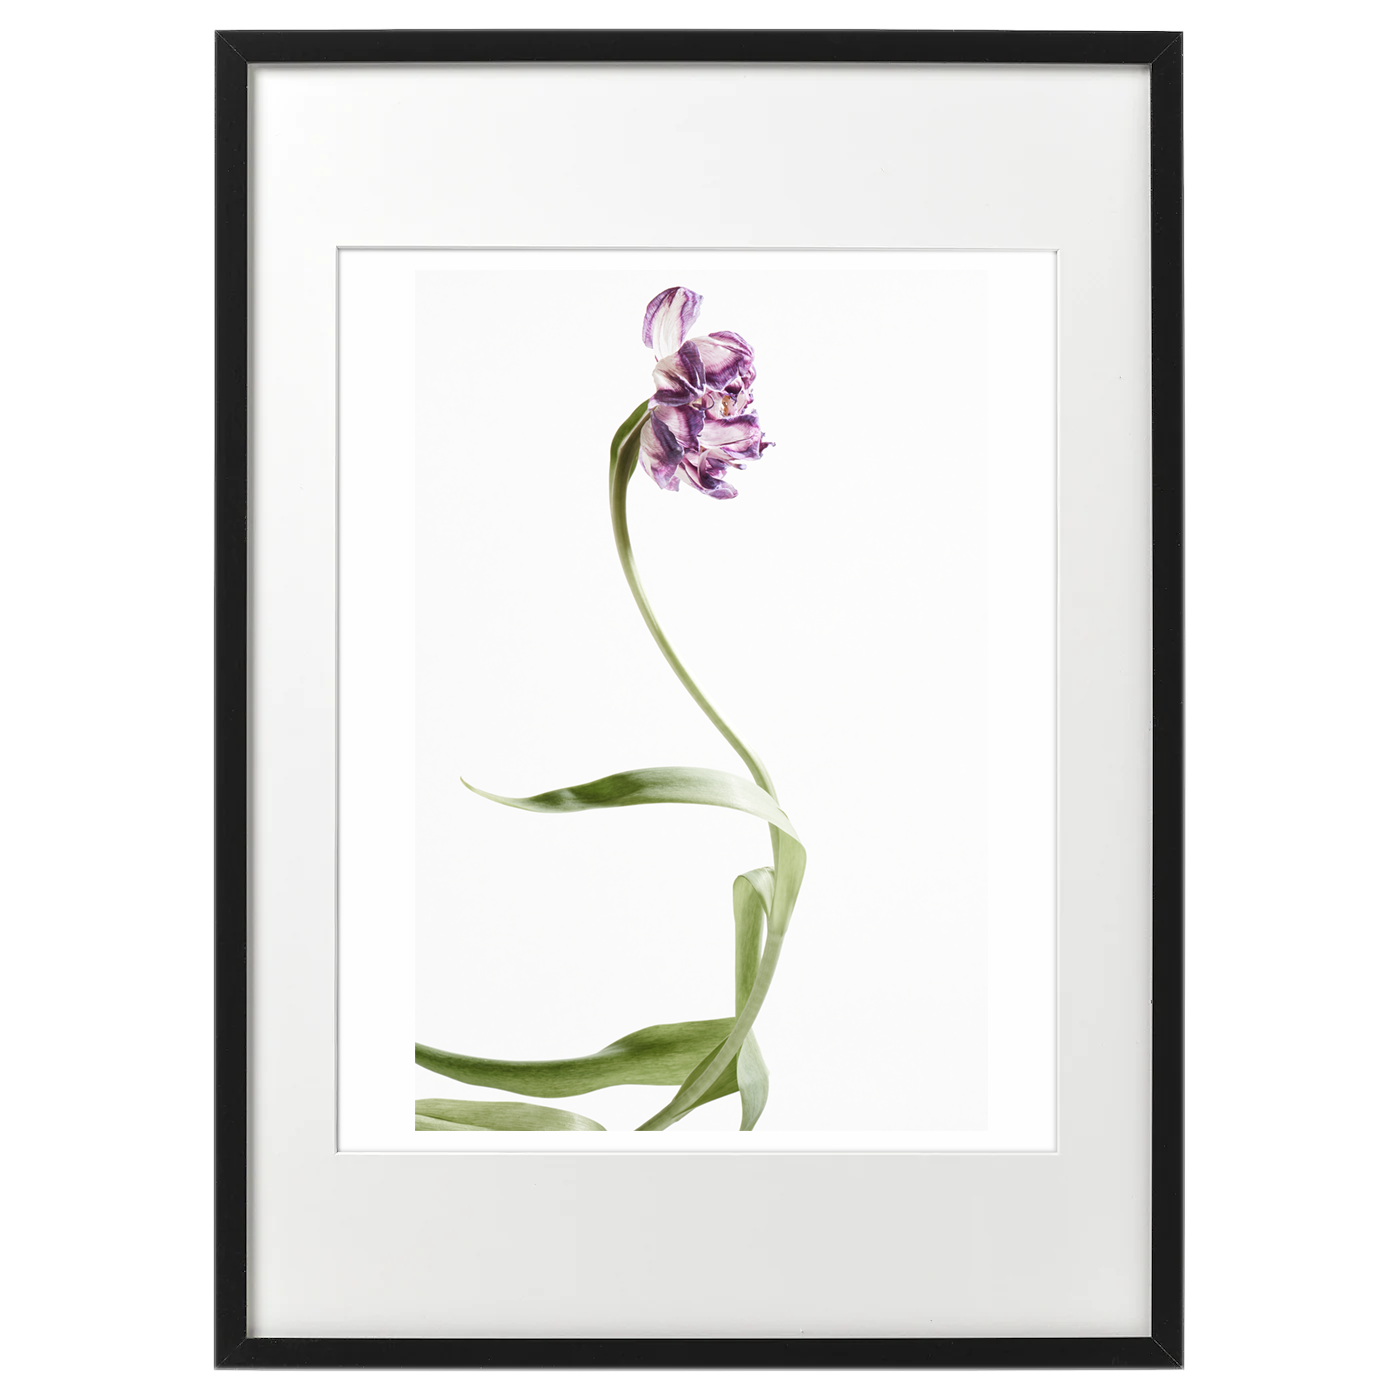 額装tulip_purple1766